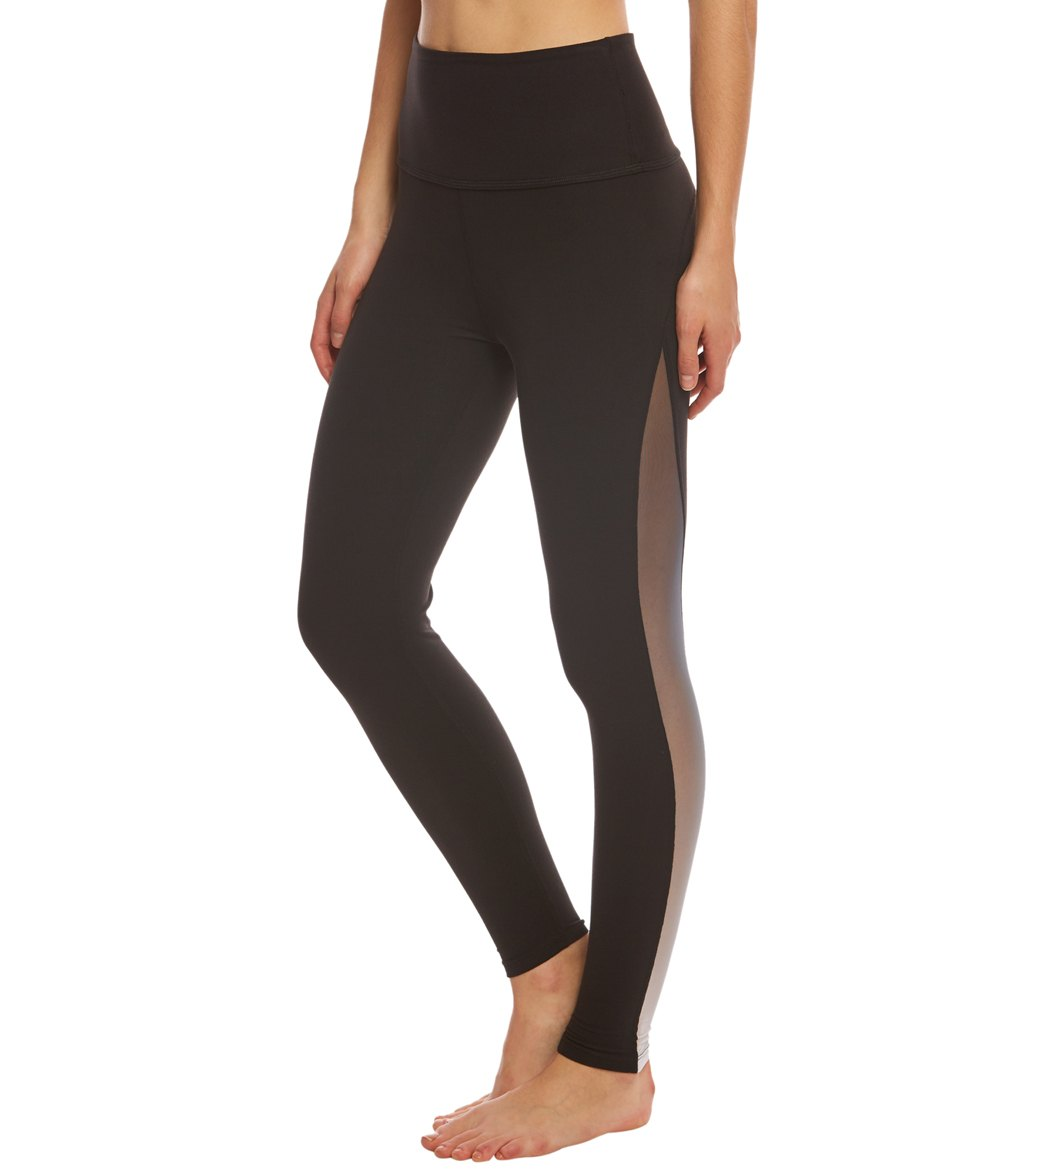 b3108268fec2a Beyond Yoga Ommmbre Mesh High Waisted 7/8 Yoga Leggings at ...